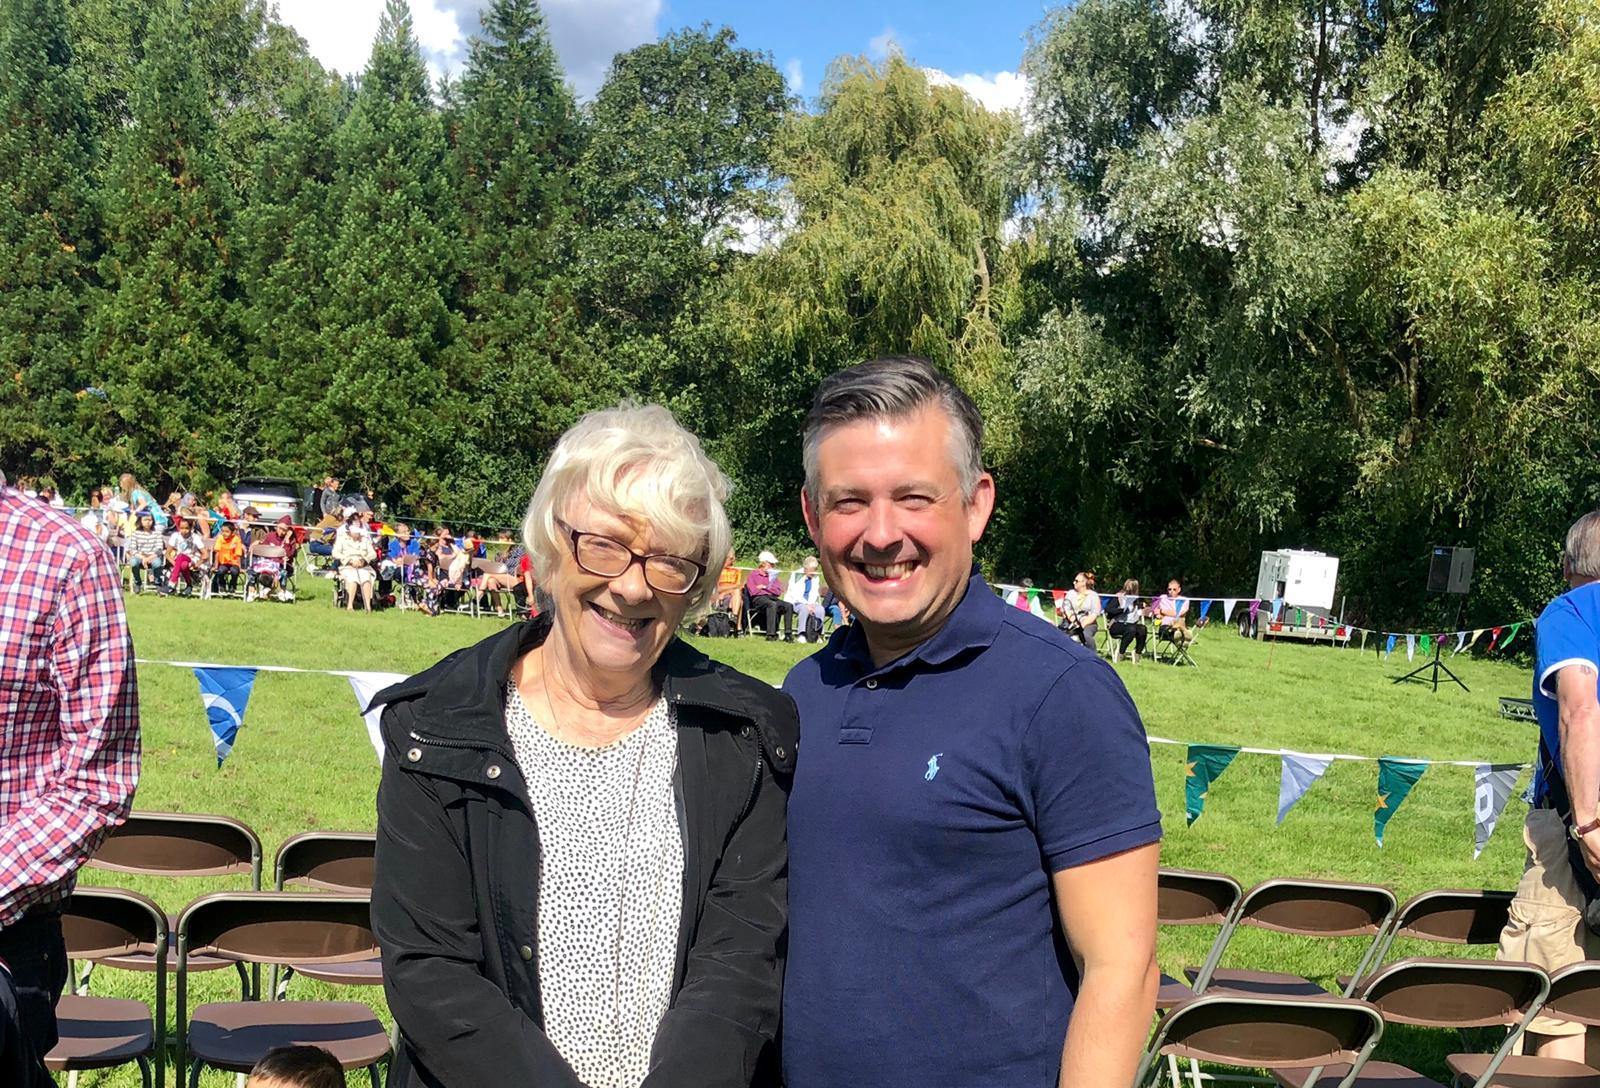 Jon and Councillor Lynn Moore at Knighton Park Community Fun Day - Sunday September 1 2019